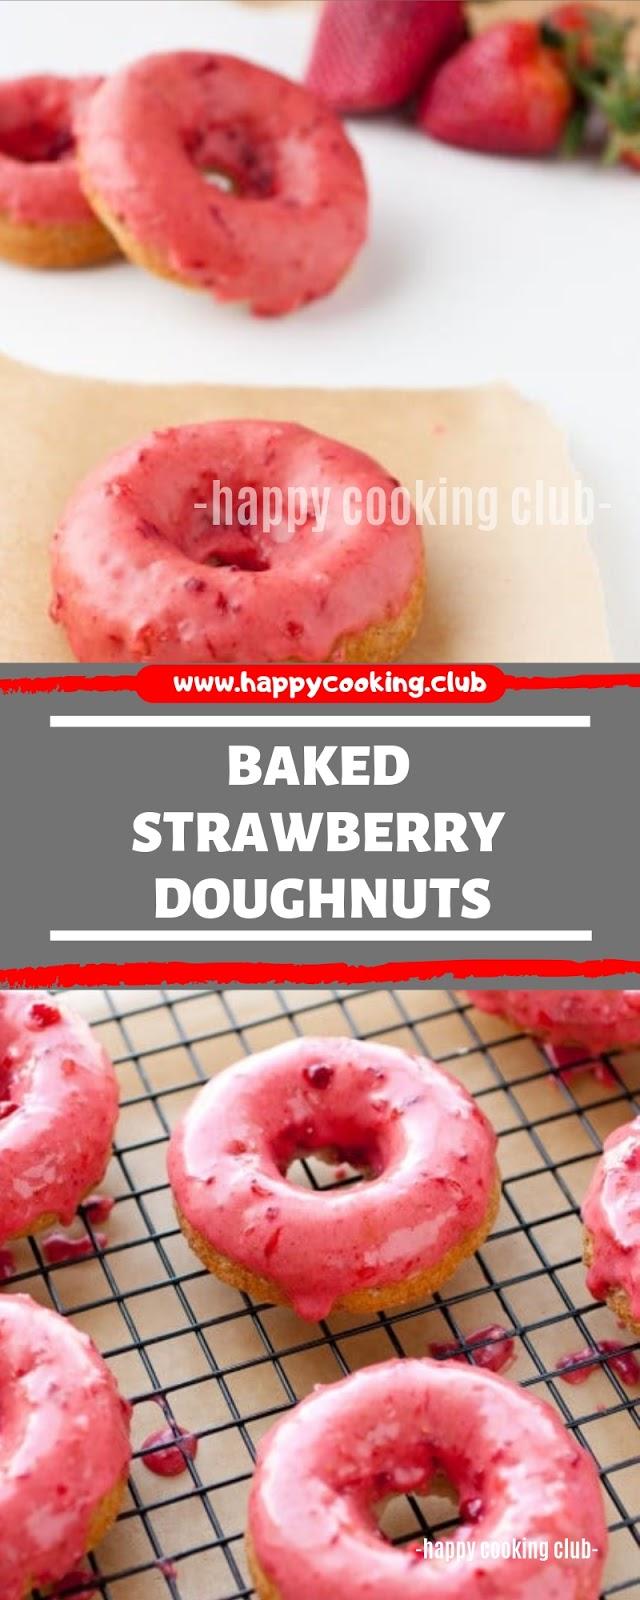 Baked Strawberry Doughnuts